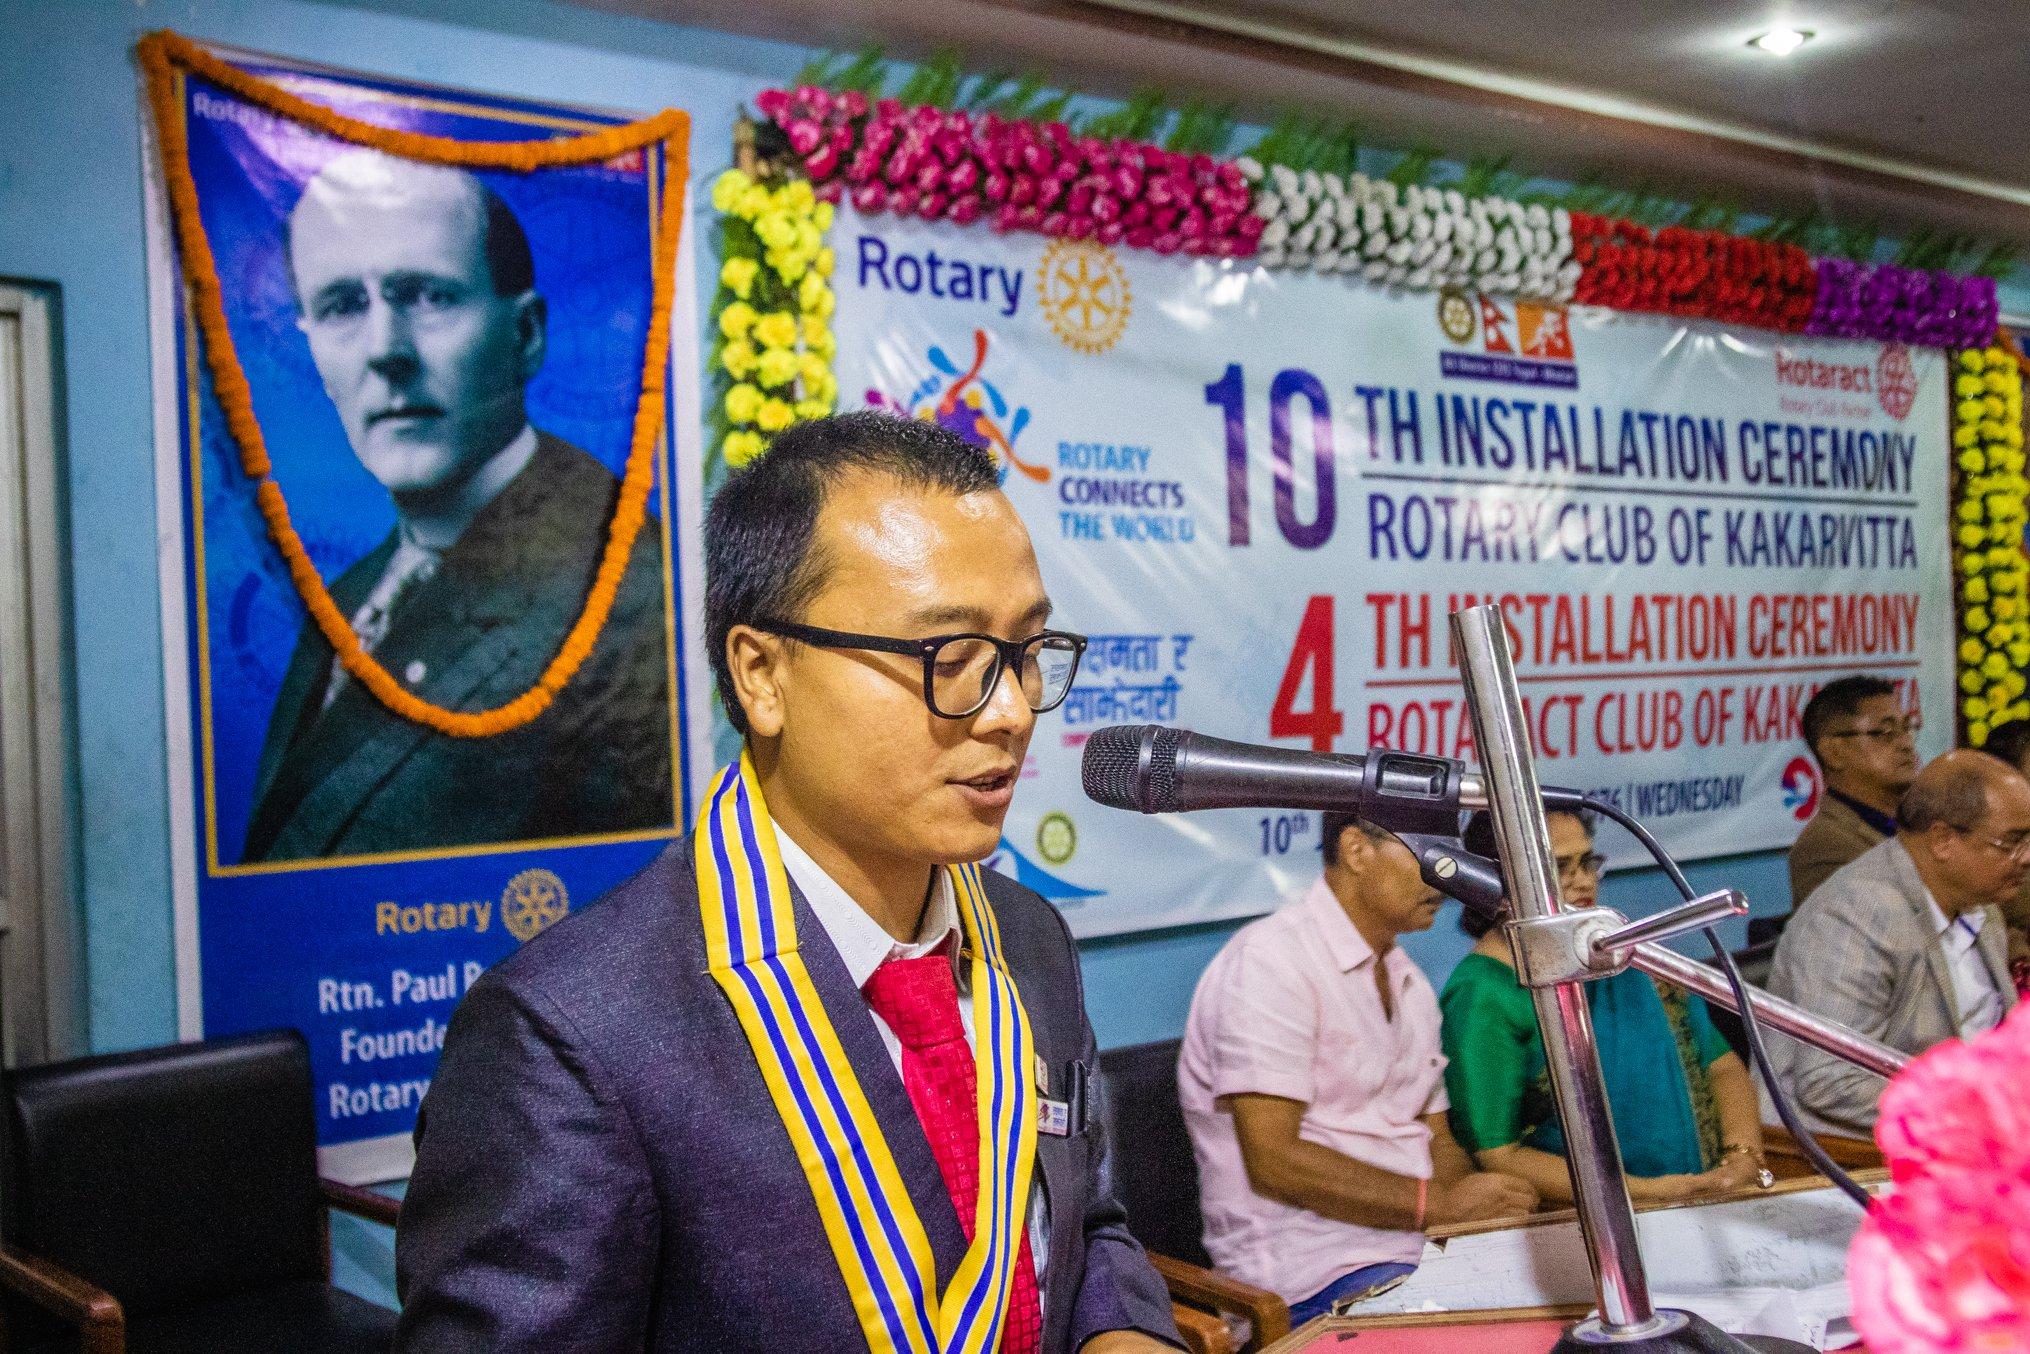 10th Installation Ceremony Rotary Club Of Kakarvitta 34